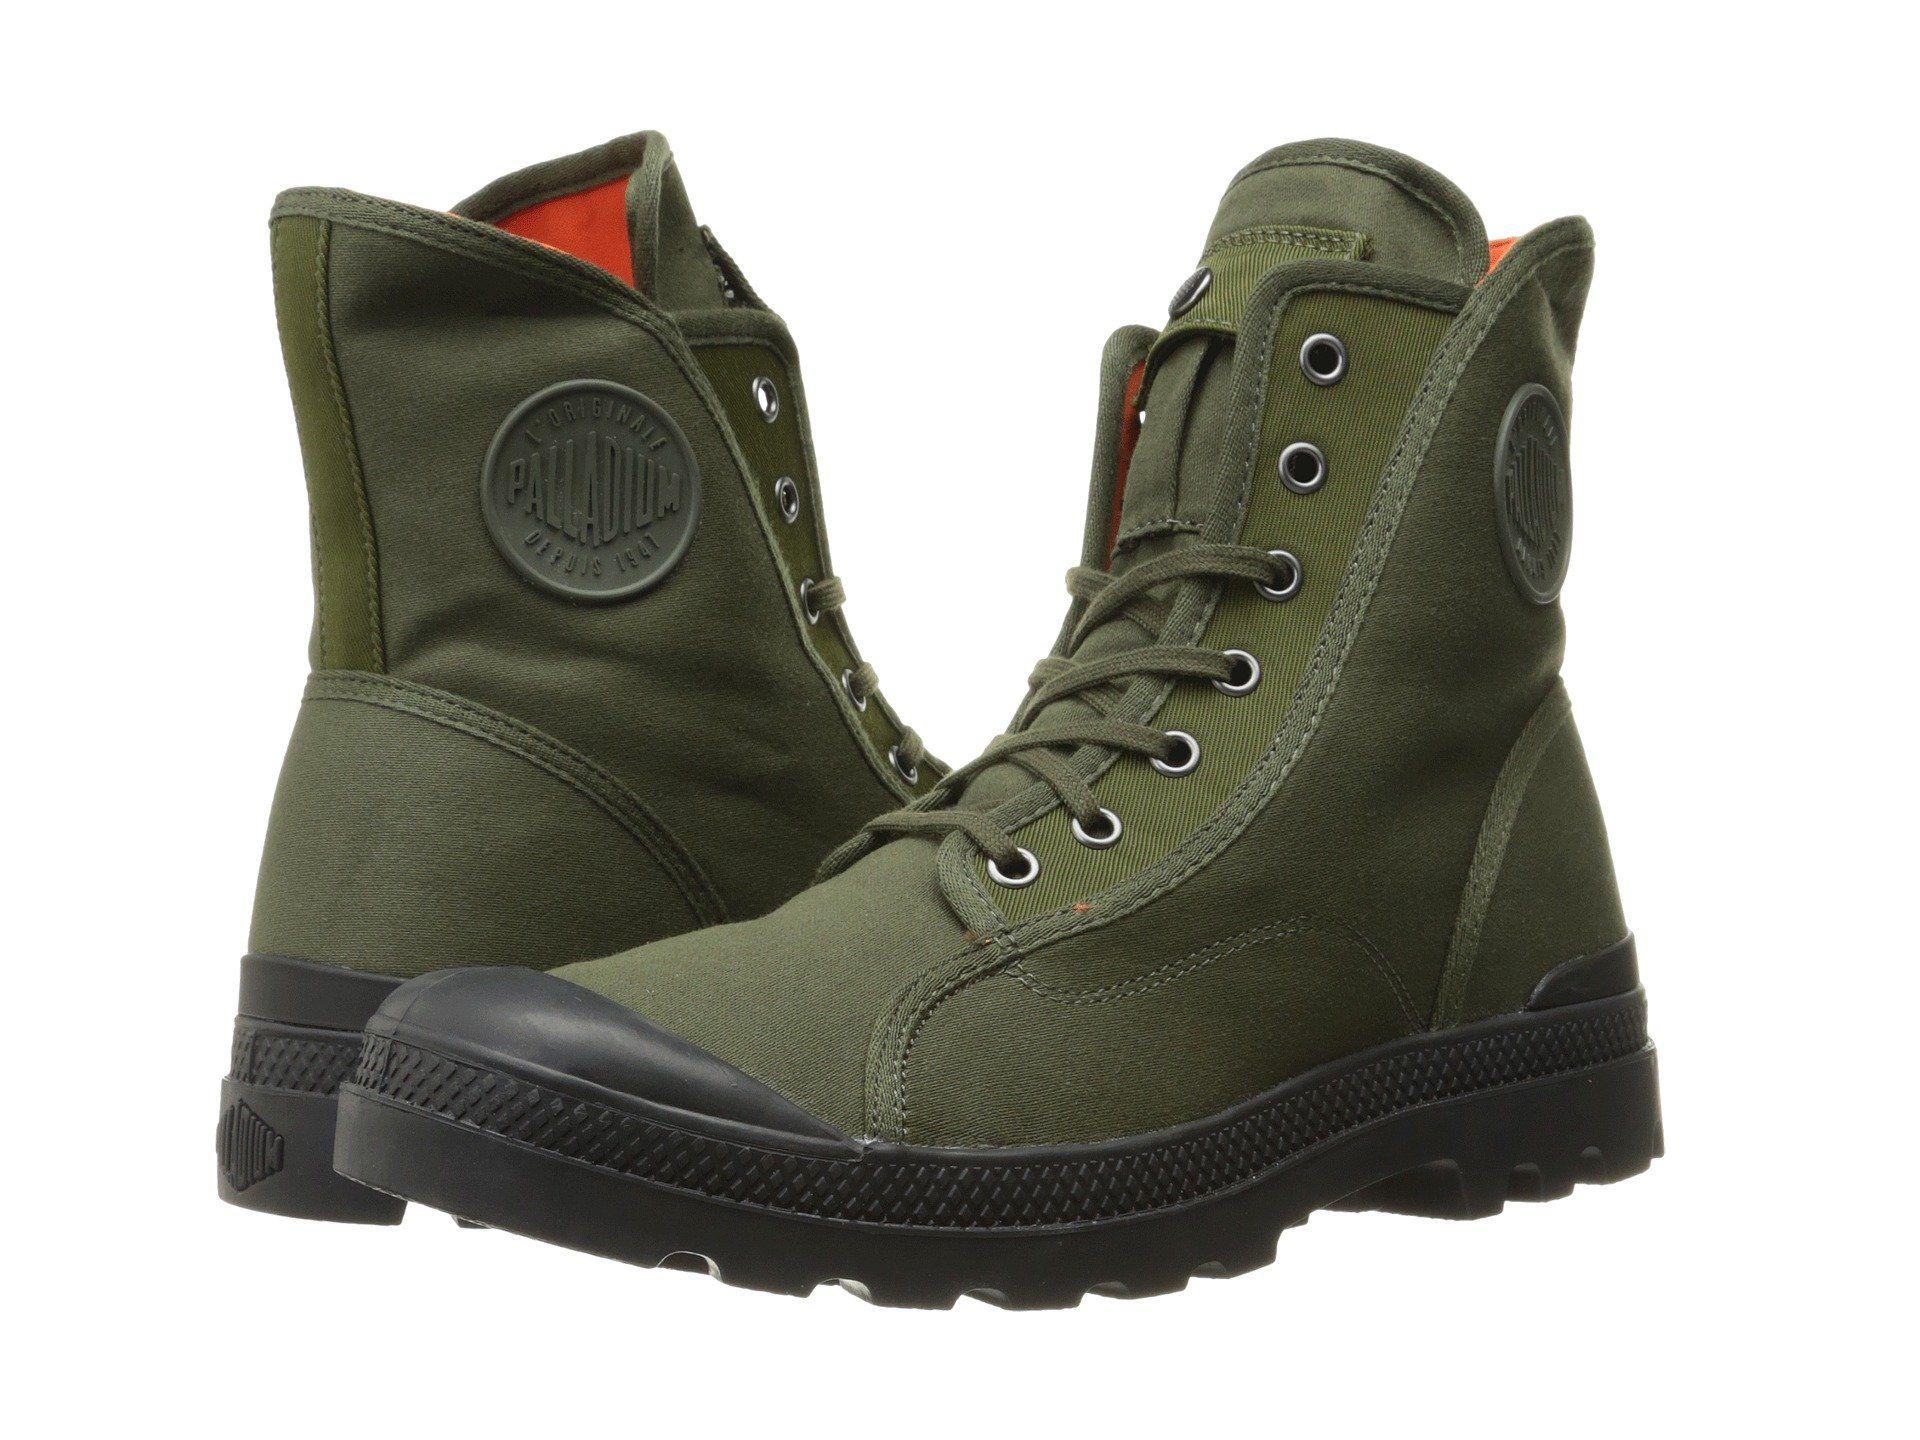 b5b85b0f33b3 PALLADIUM Pampa M65 Hi.  palladium  shoes